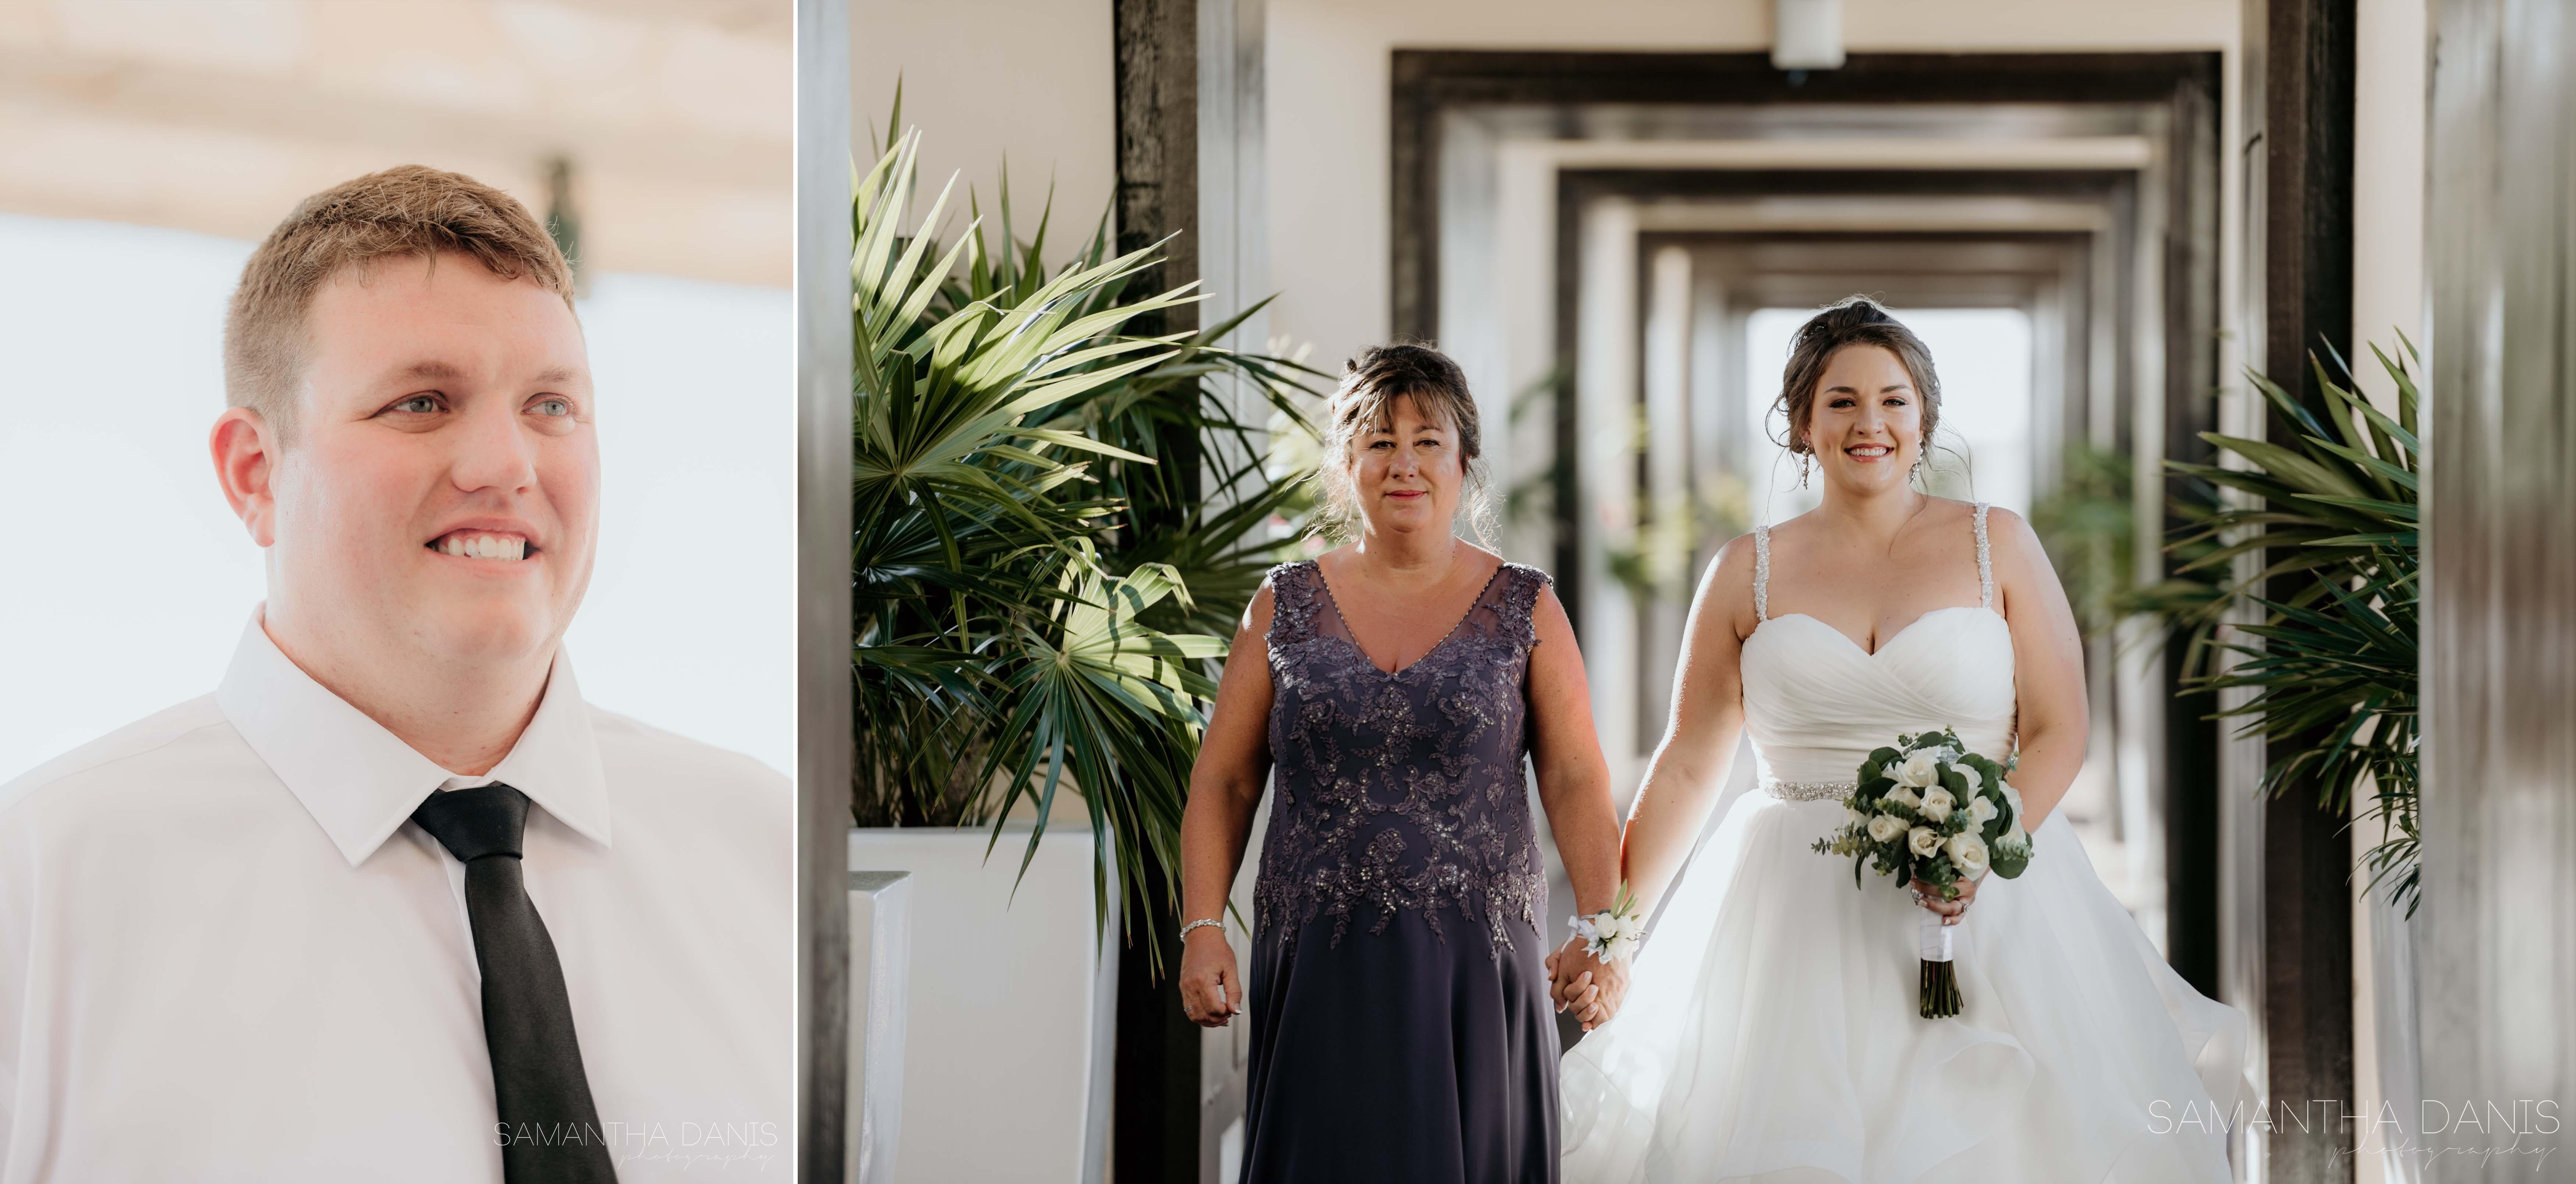 Ottawa wedding Samantha Danis Photography forest wedding destination wedding Mexico